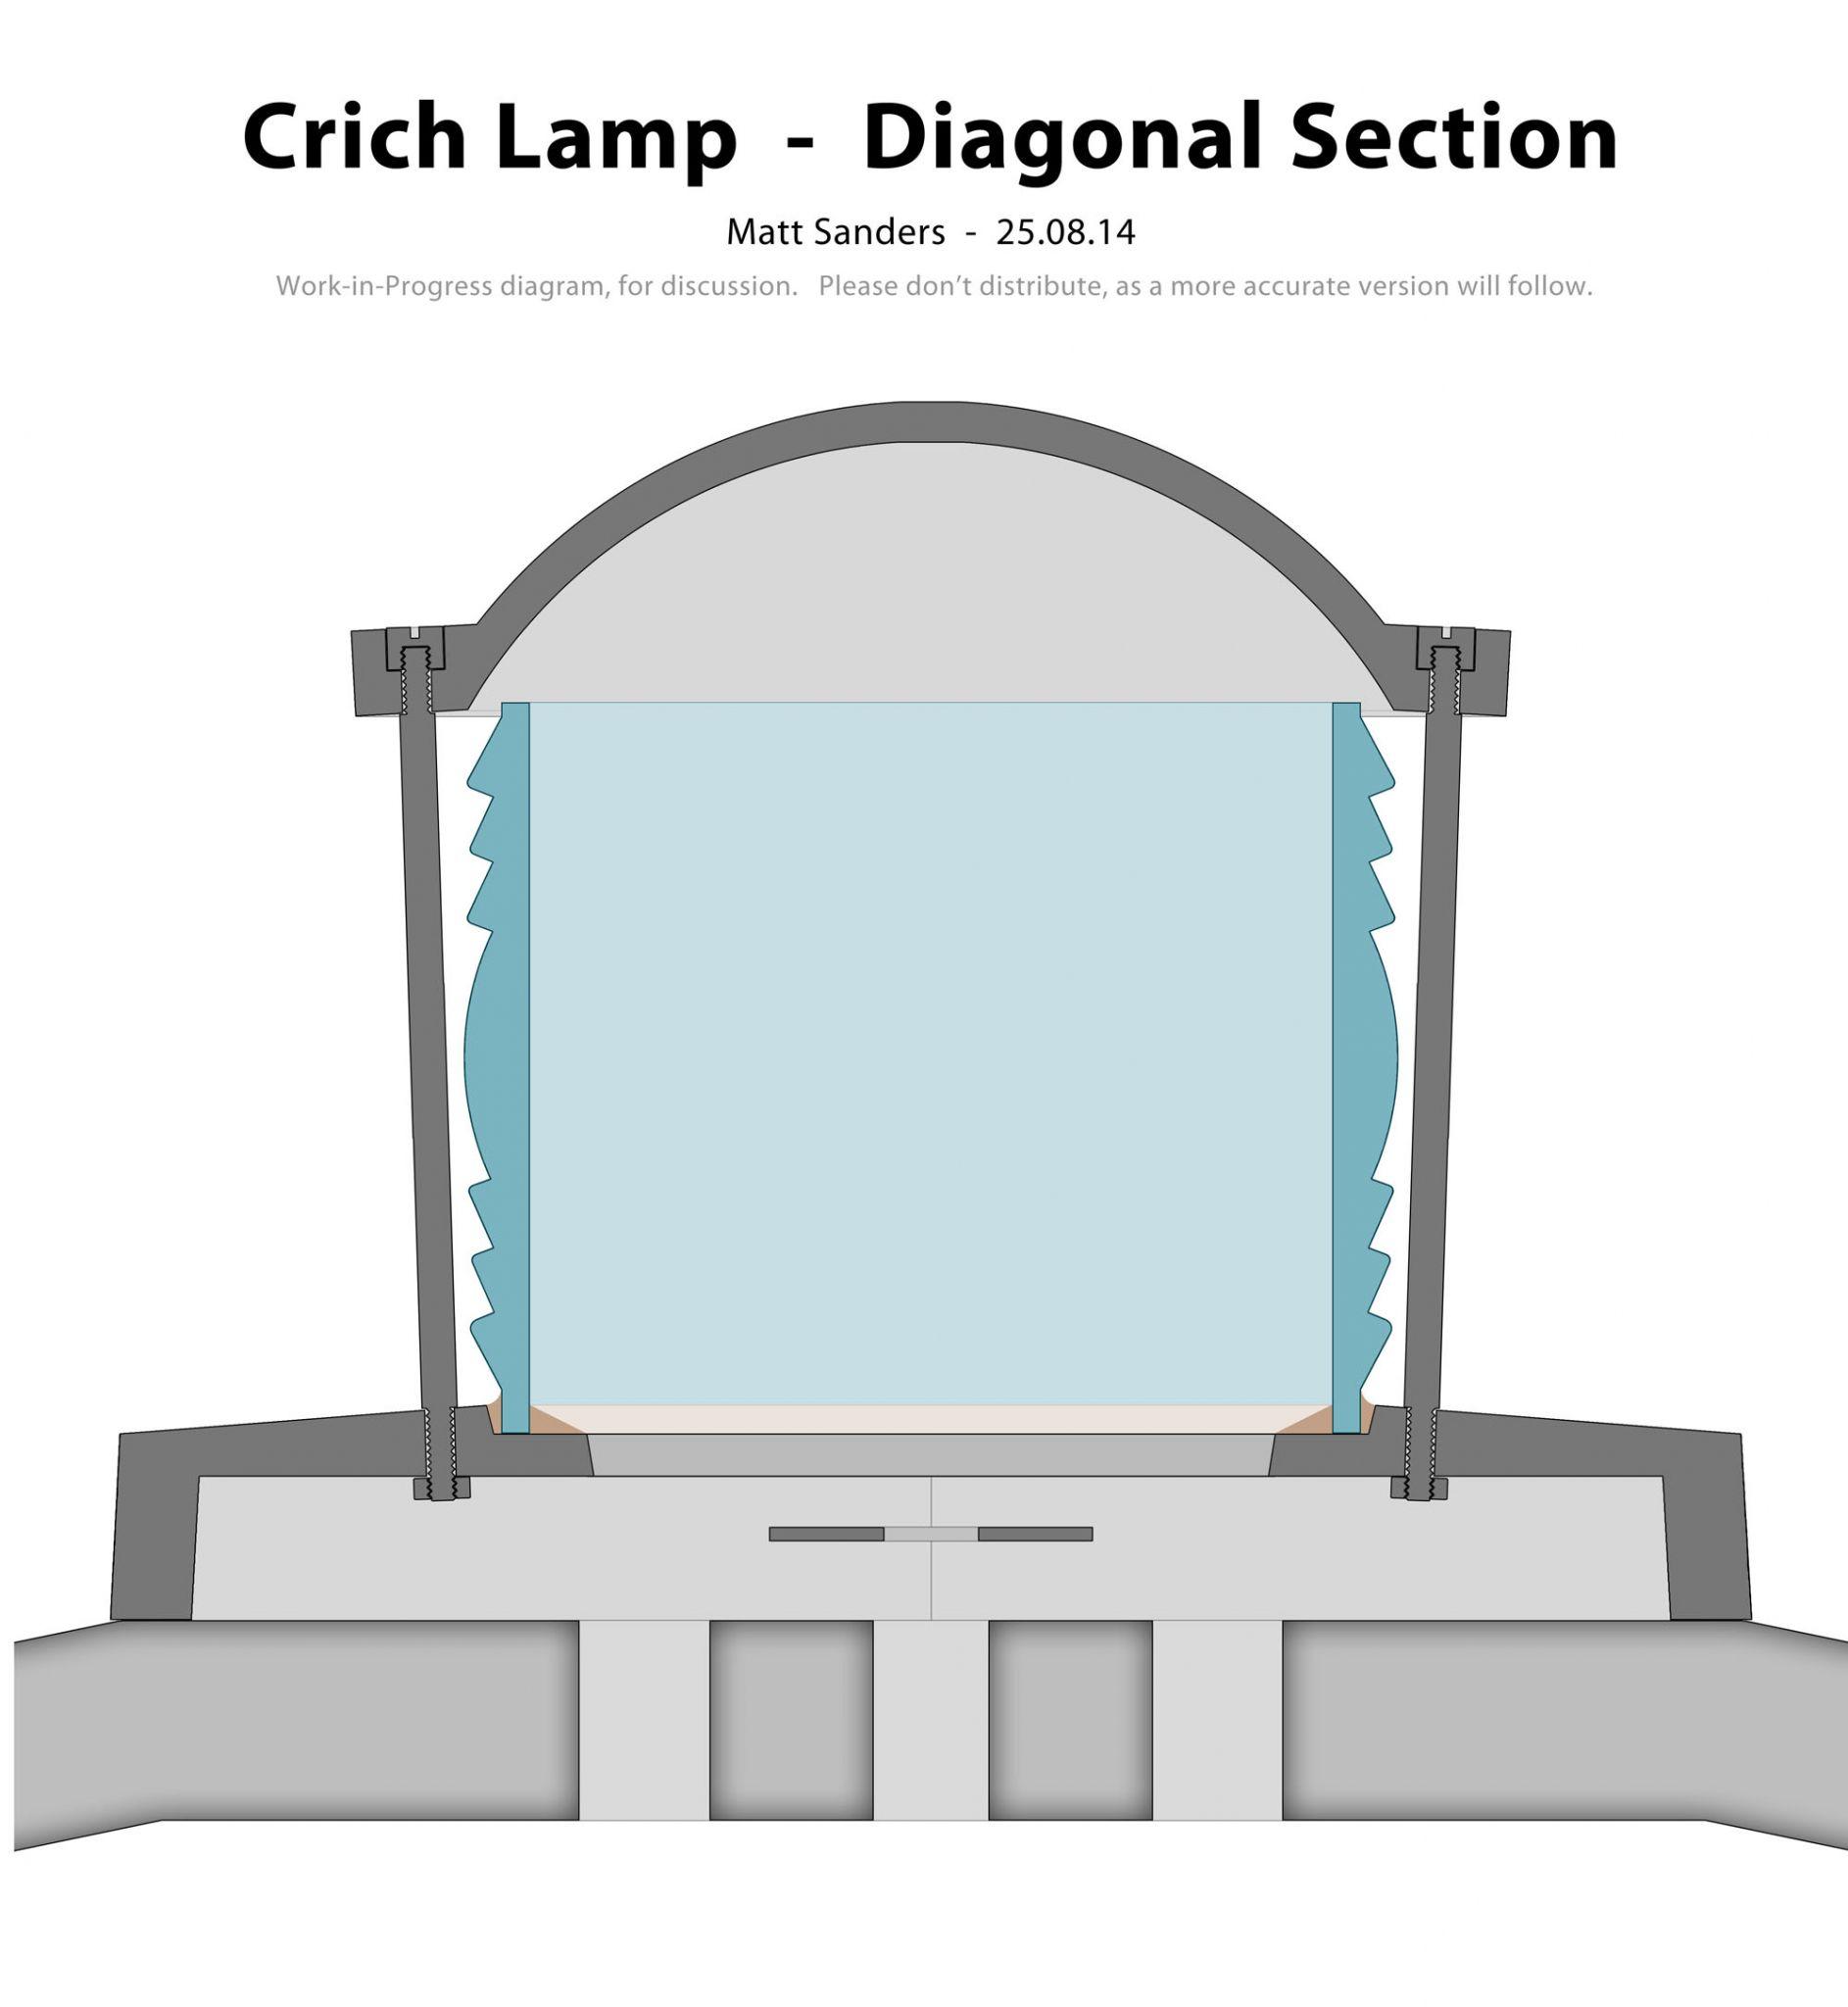 CrichLampDiagonalSection25Aug.jpg